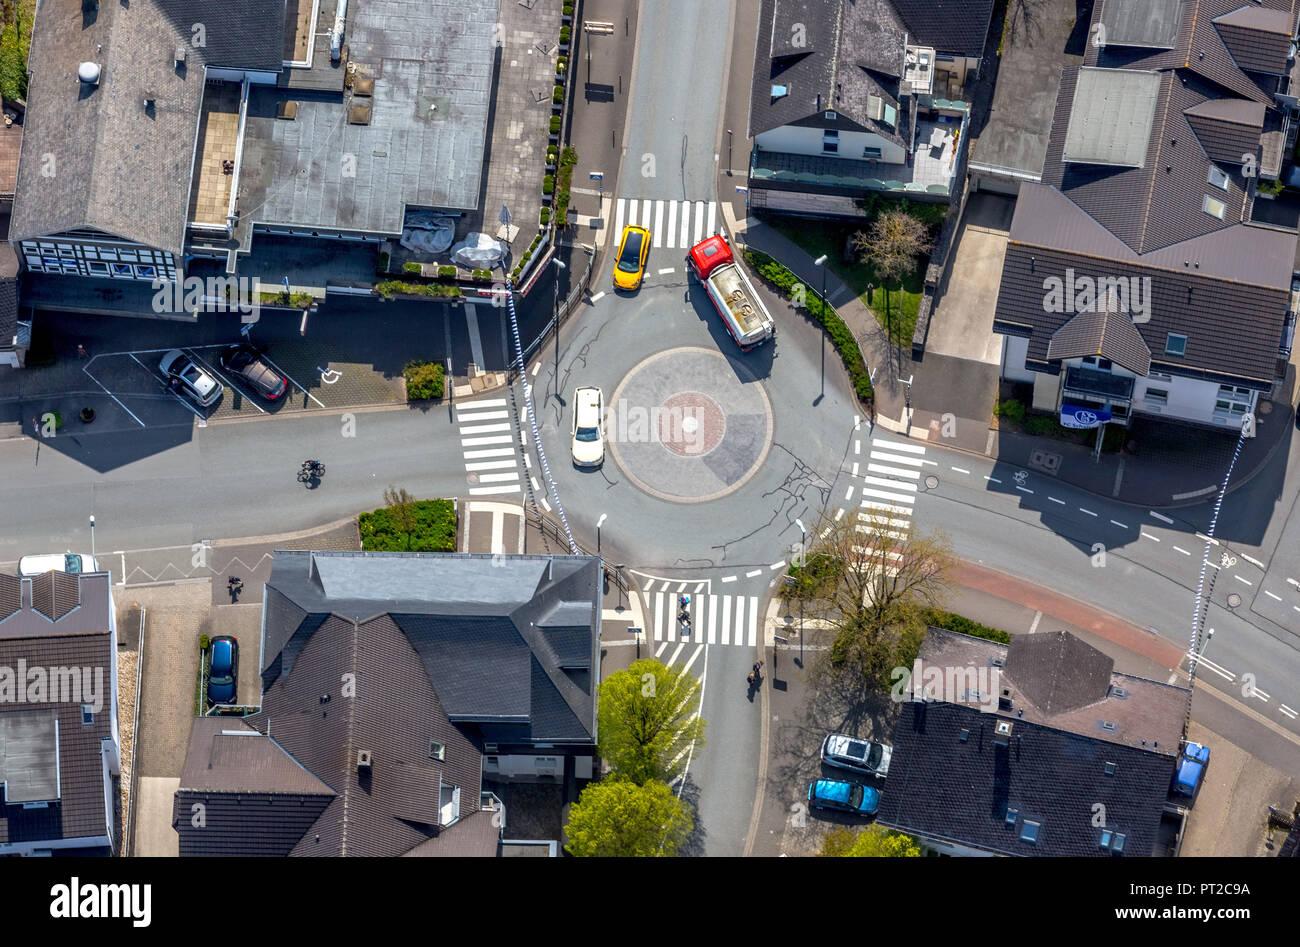 Roundabout Strackestrasse and Obere Mauer, Brilon, Sauerland, Hochsauerlandkreis, North Rhine-Westphalia, Germany, Europe - Stock Image